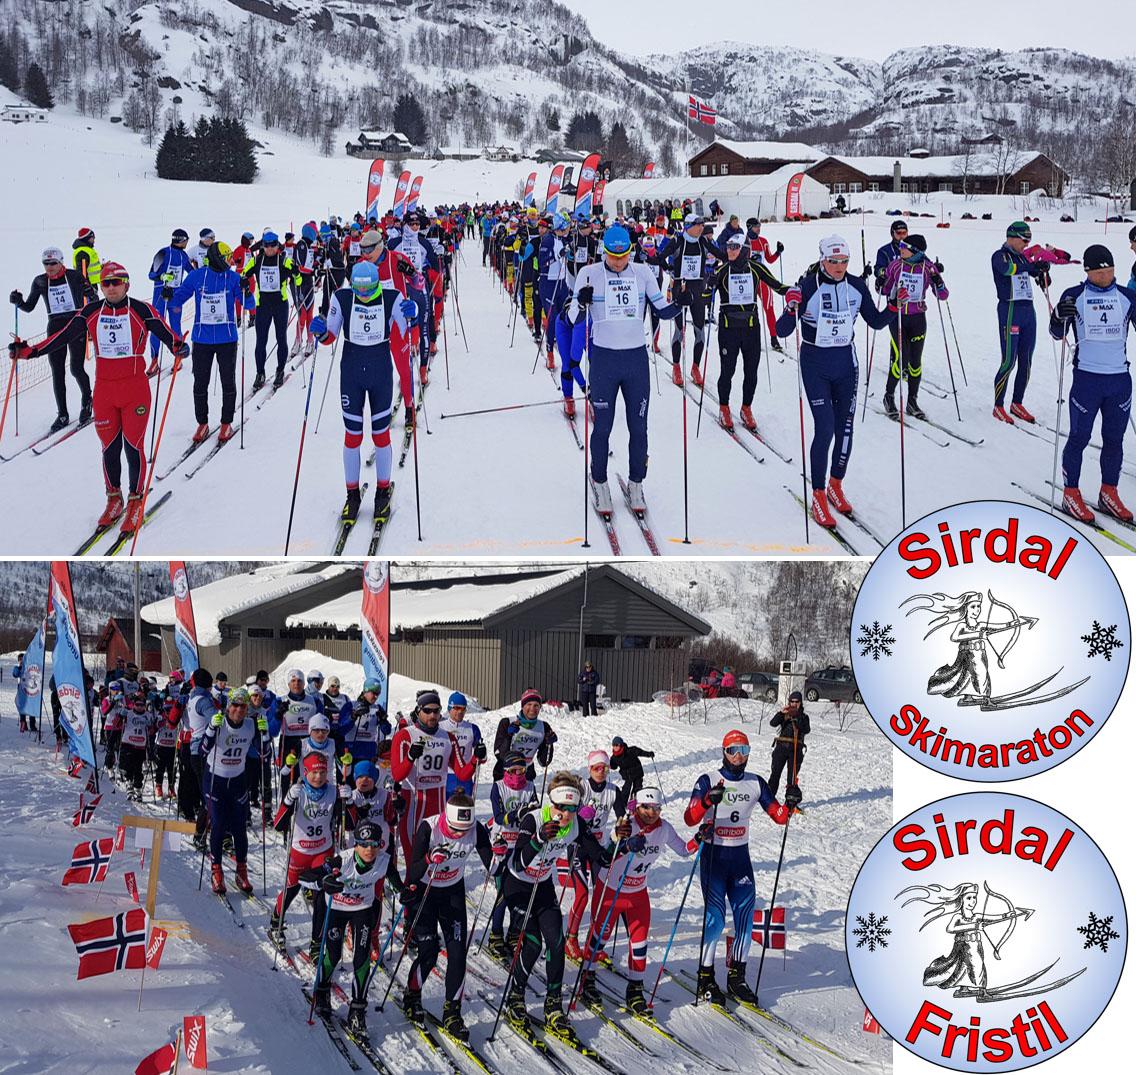 skimaraton og fristil i 2018